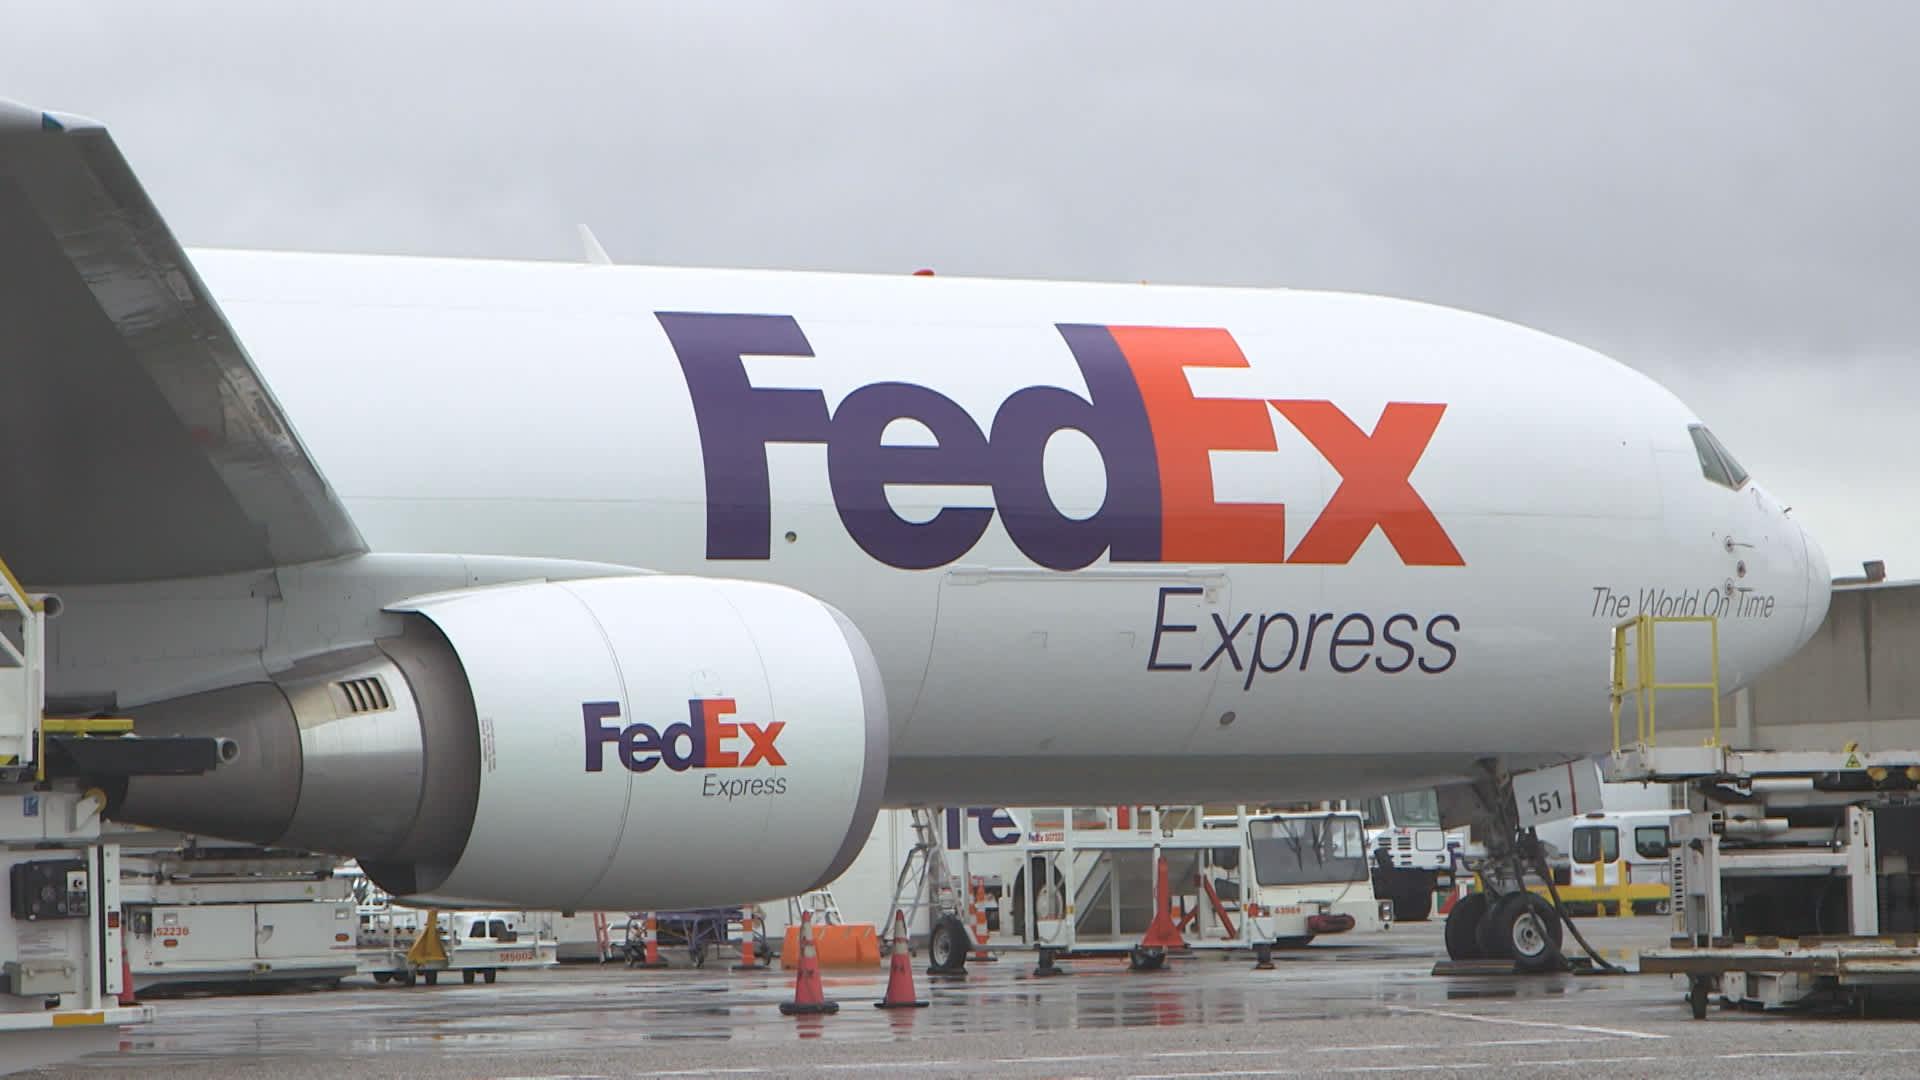 FedEx downgraded by Bernstein: 'Bull thesis has been shredded'